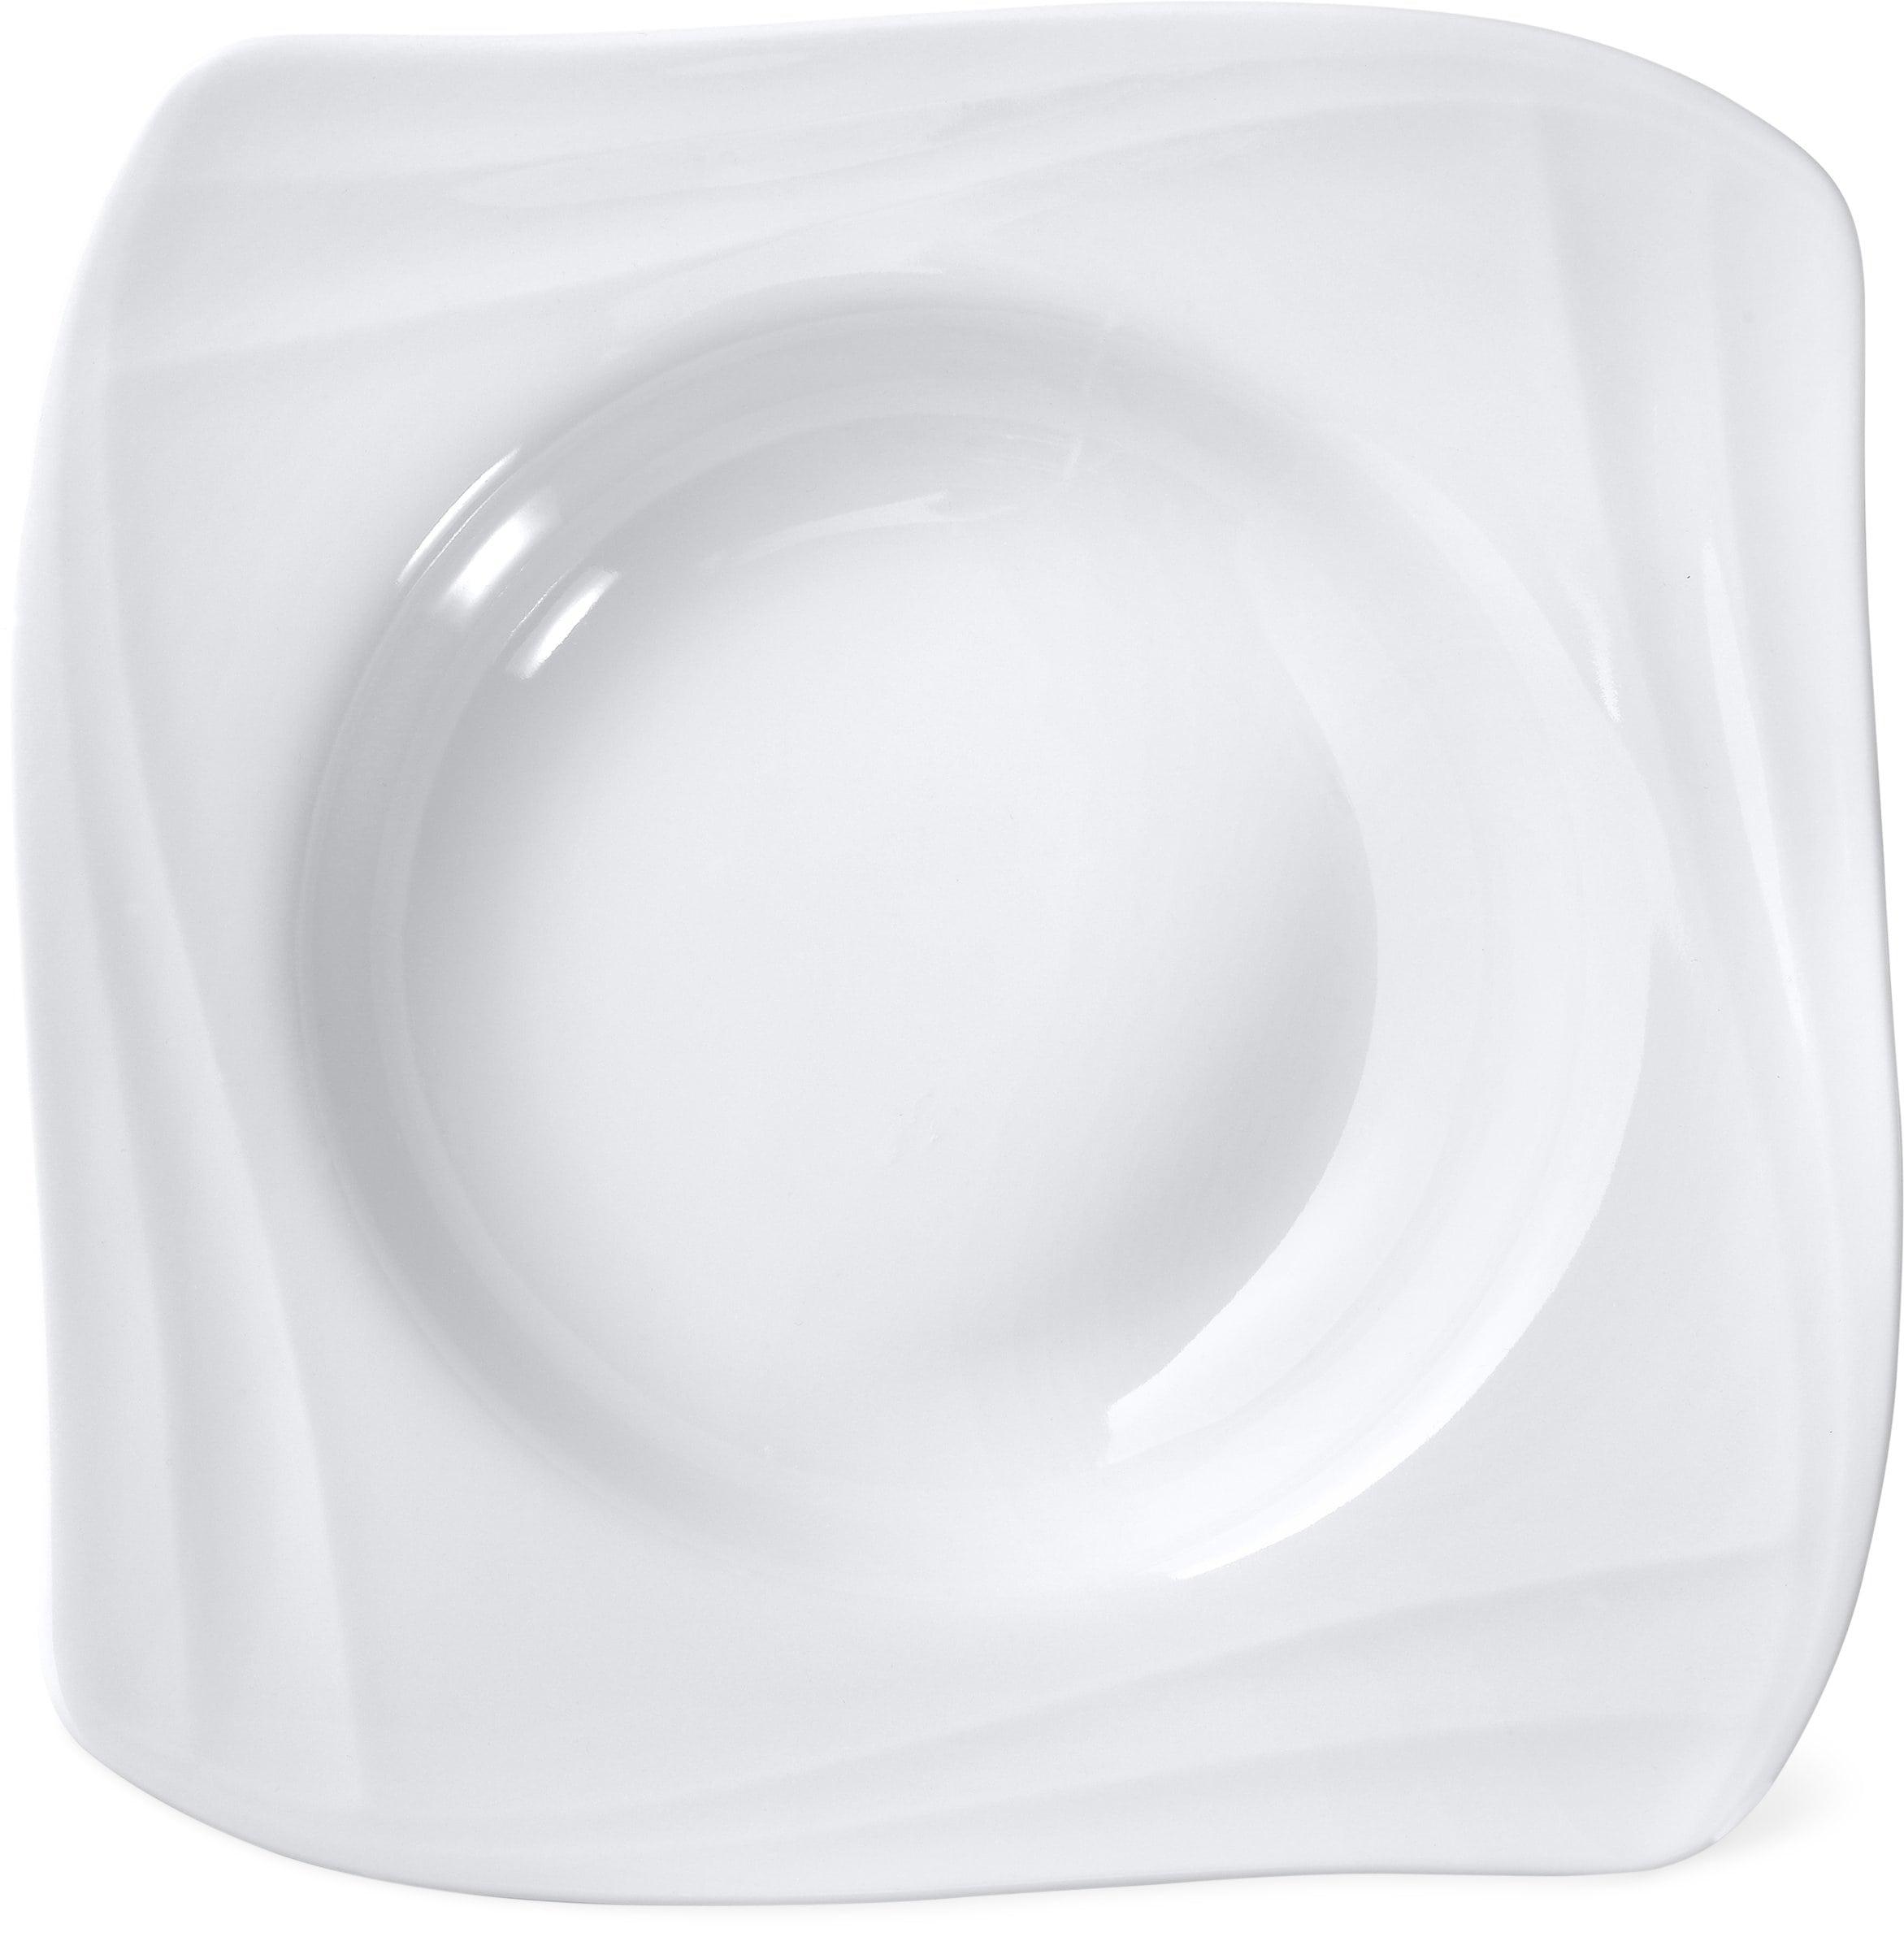 Cucina & Tavola VANITY Assiette creuse